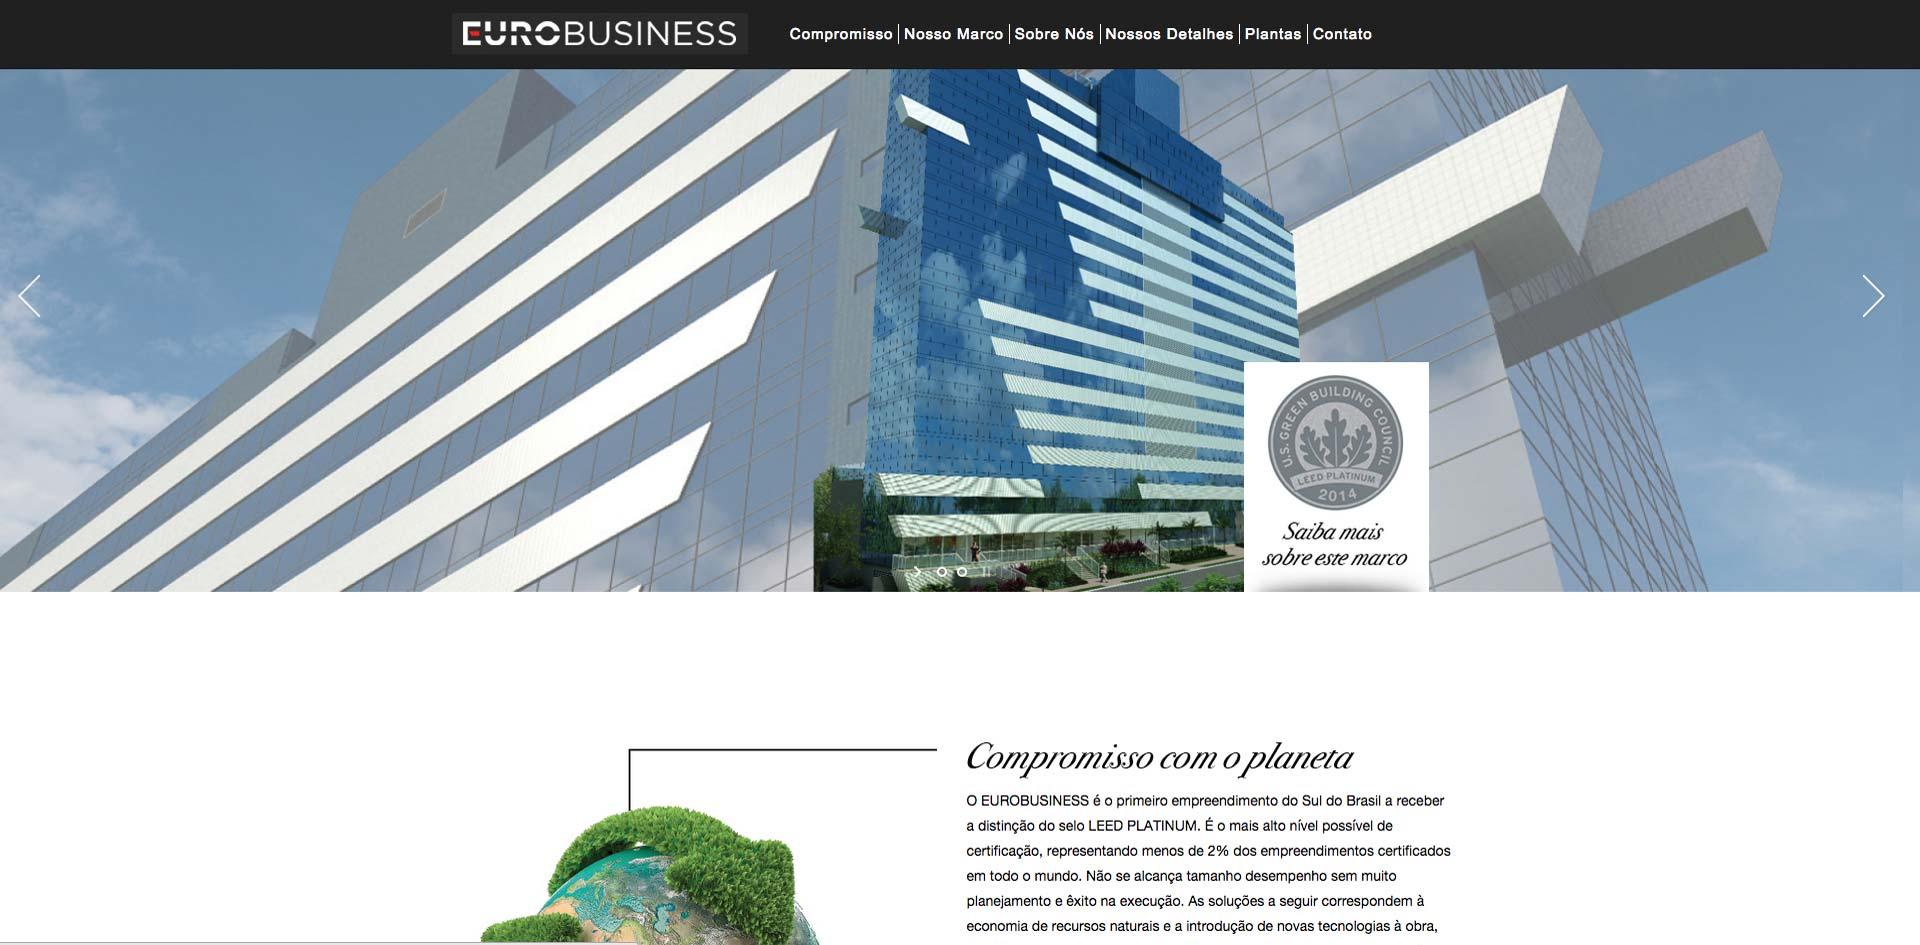 6-EUROBUSINESS